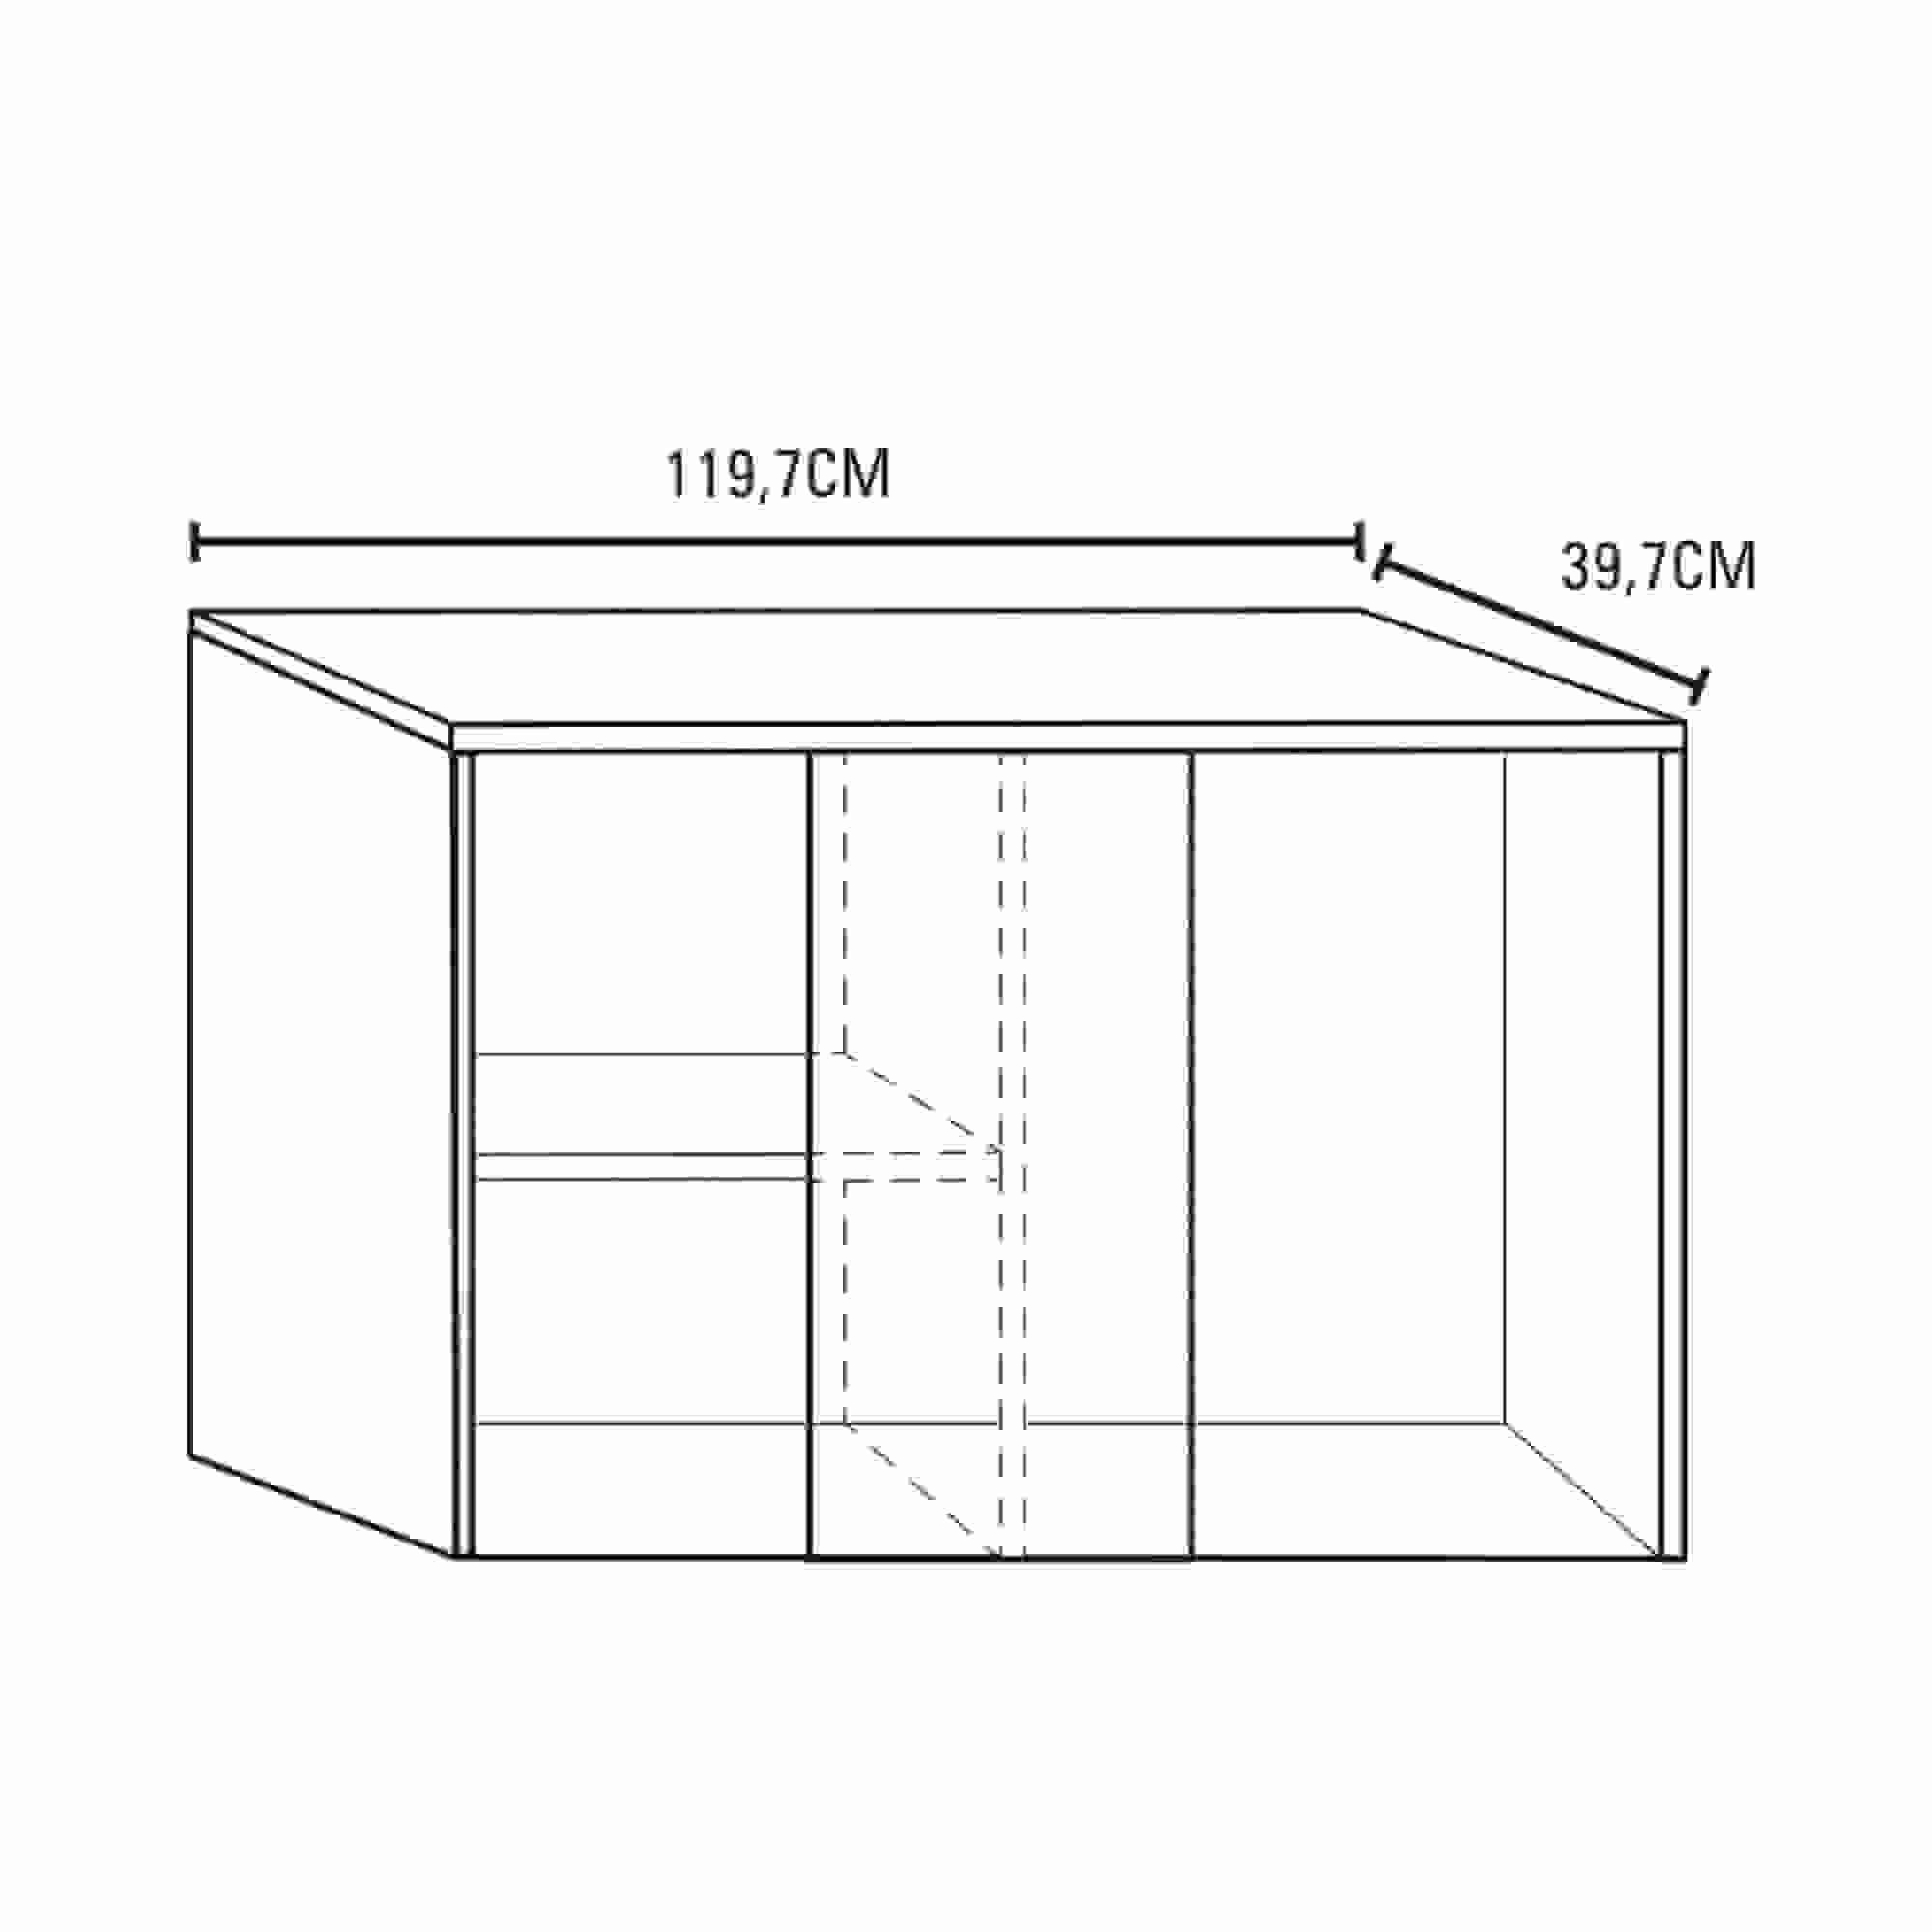 mesa-m24030-mueble-acuario-acuarios-aqualux-240-aqualight-aqualed-armario-med